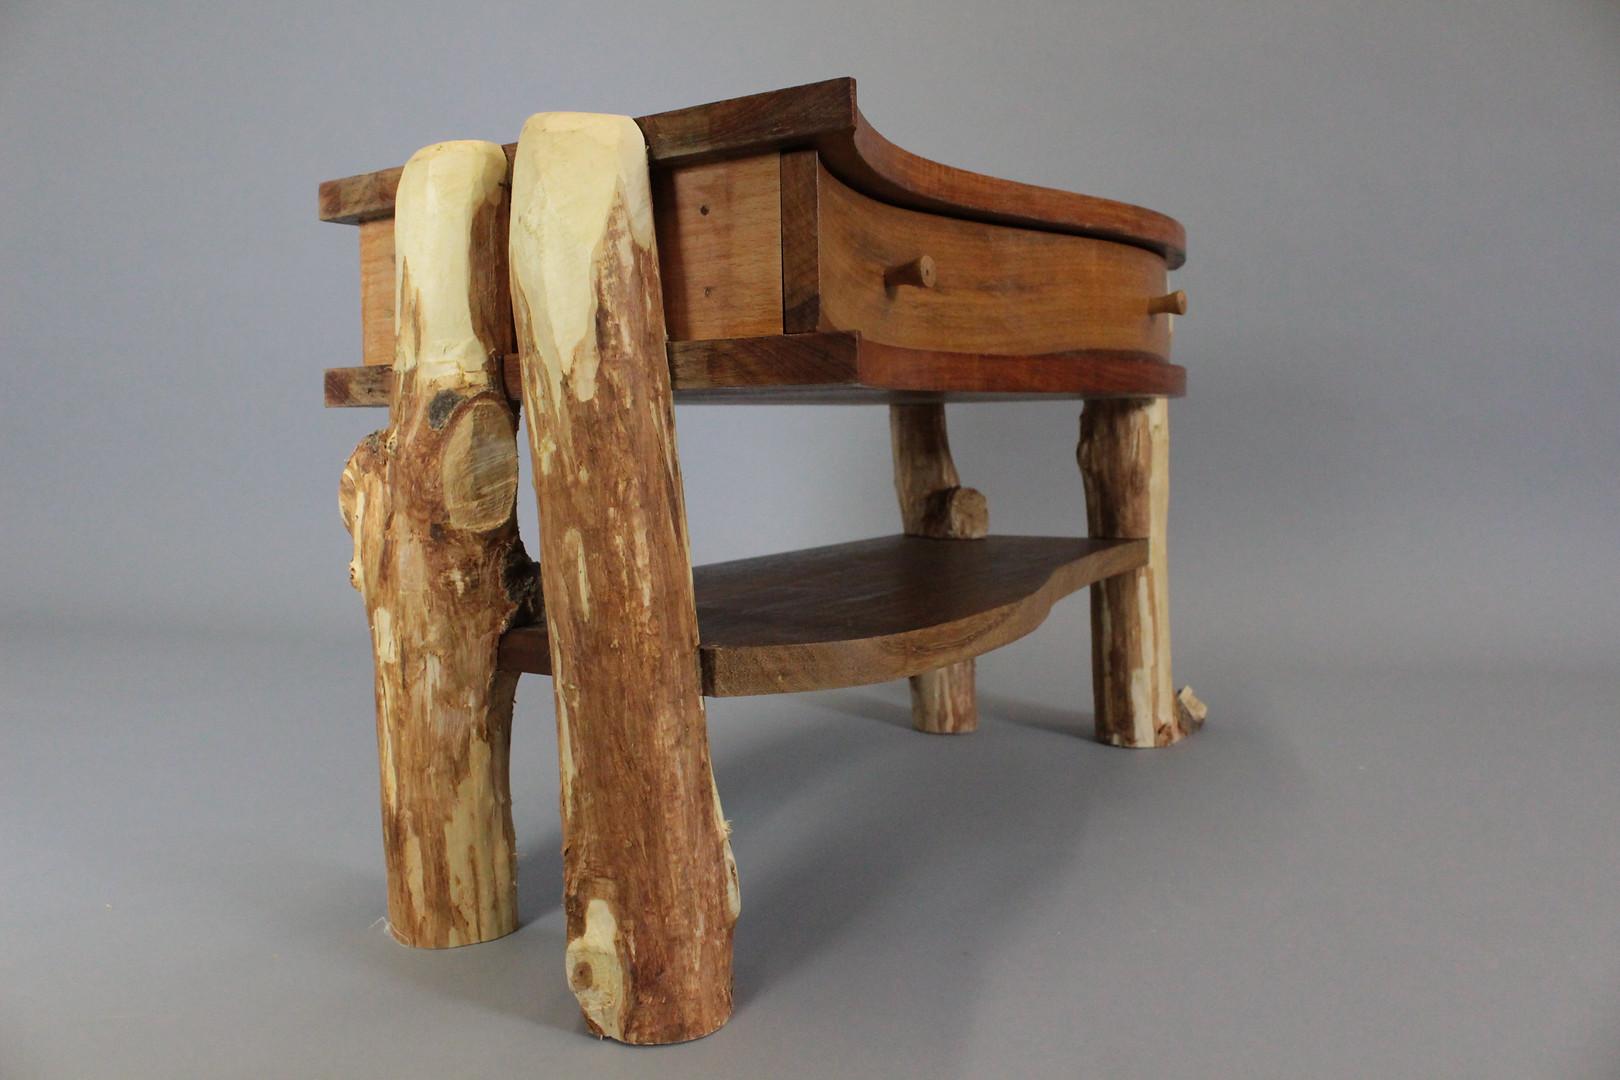 Re-purposed Rustic legged side table